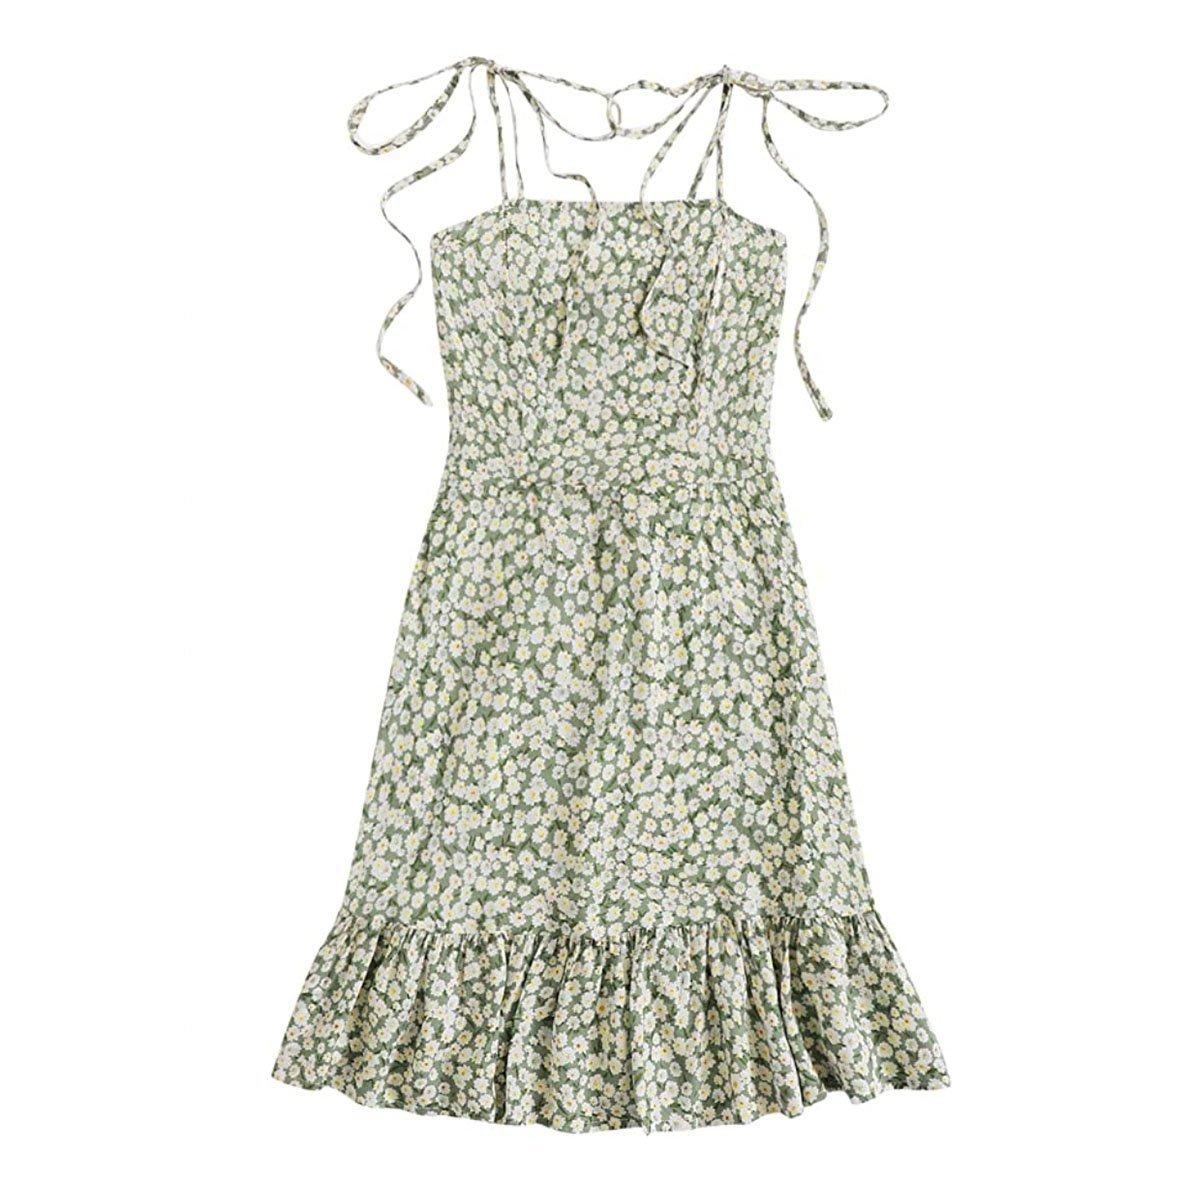 Daisy Dress | Monday Morning Musings | No.173